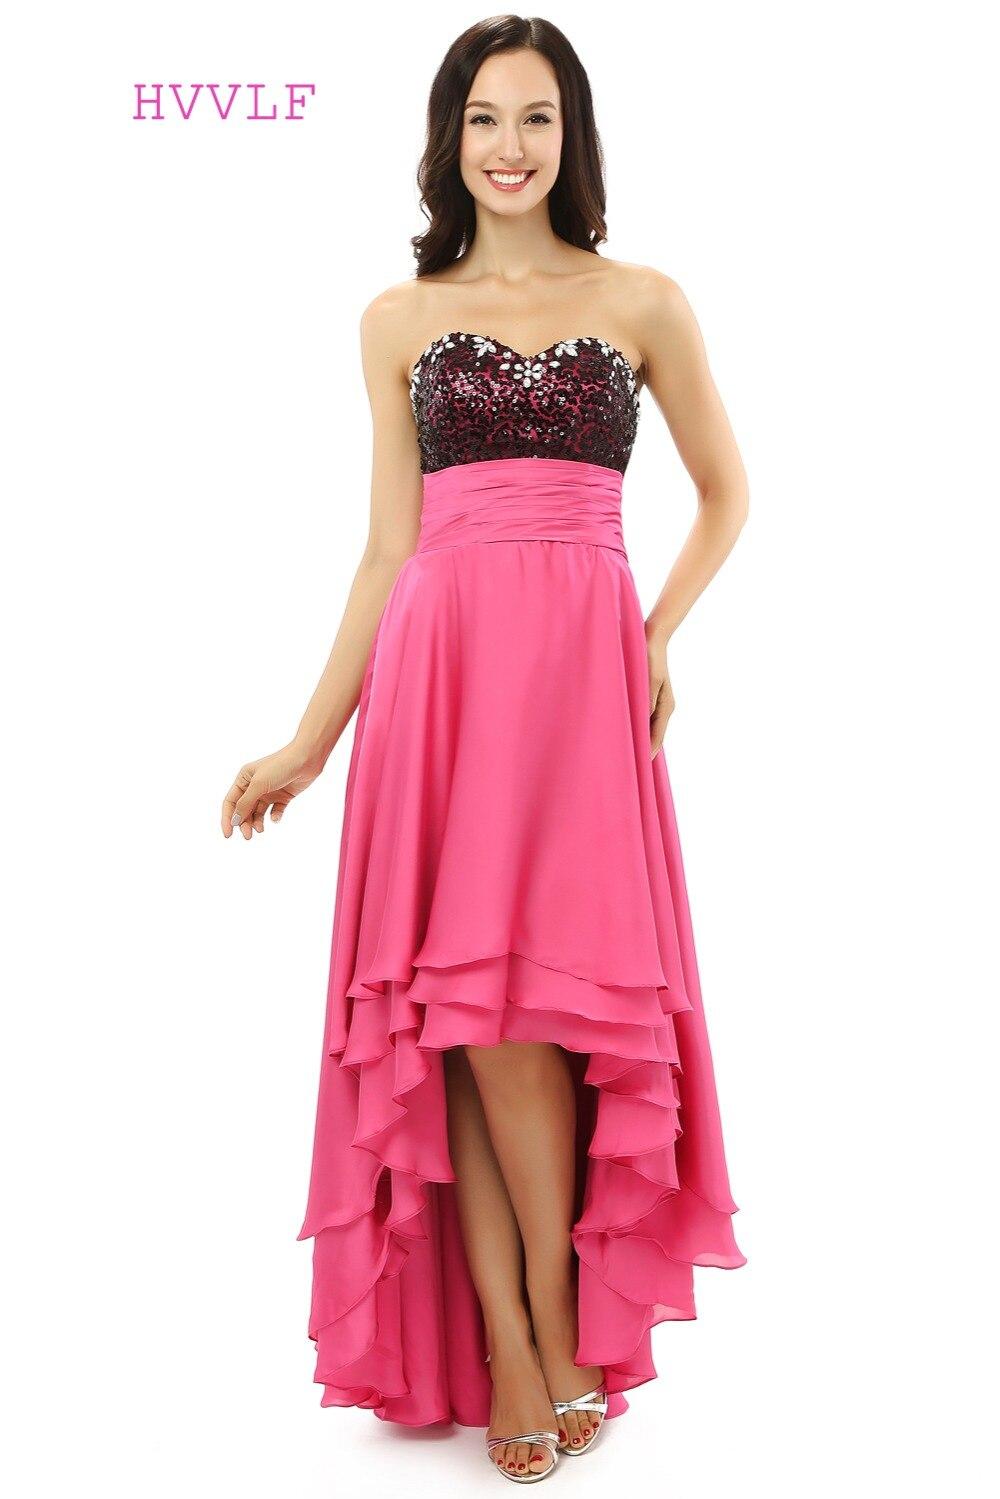 Pendek Depan Panjang Kembali 2018 Prom Dresses A Line Sayang Rak Tas Gantung Princess Hanging Bag Organizer Fuschia Fuchsia Chiffon Sequin Gown Evening